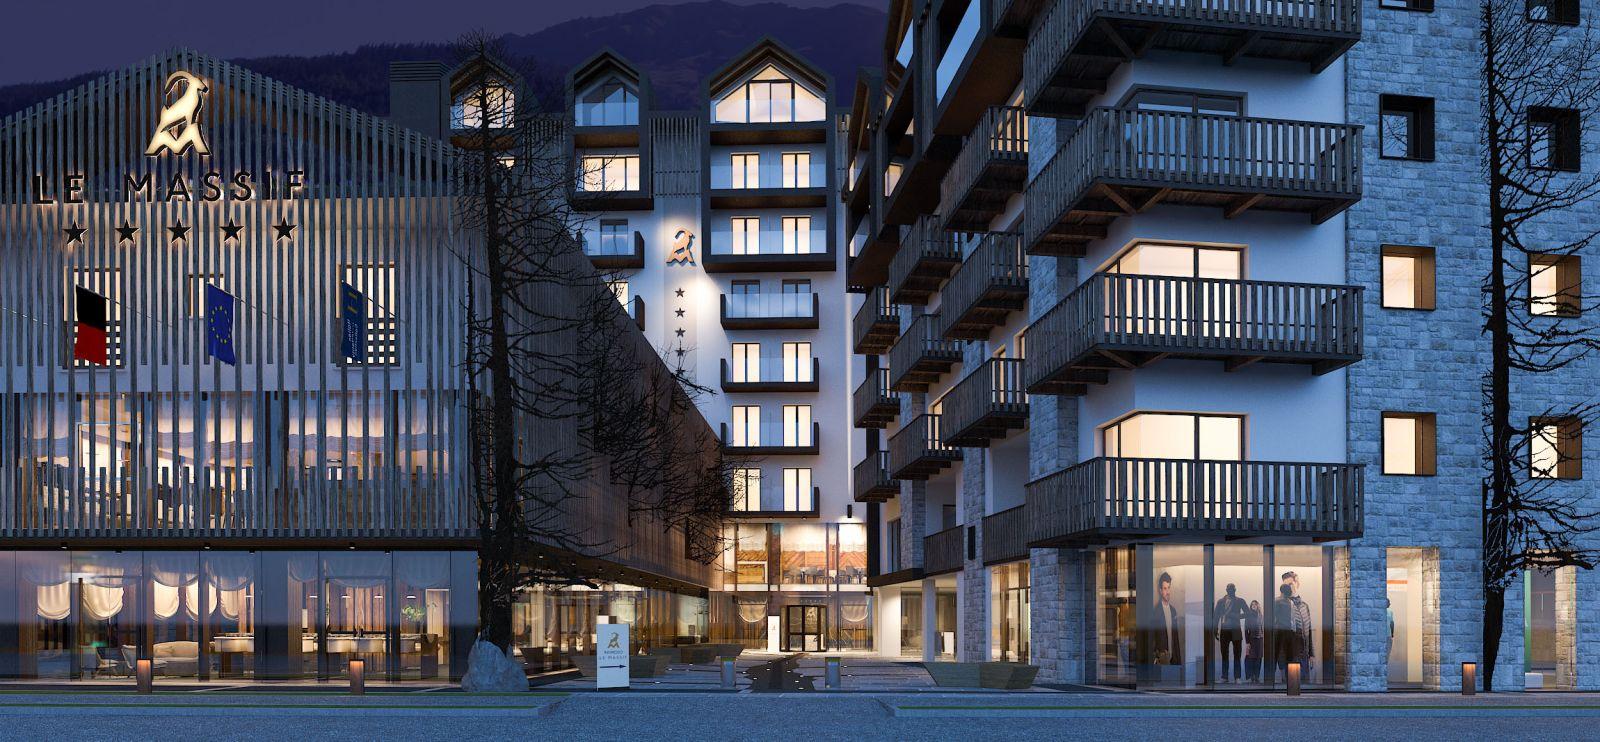 Hotel Massif  917